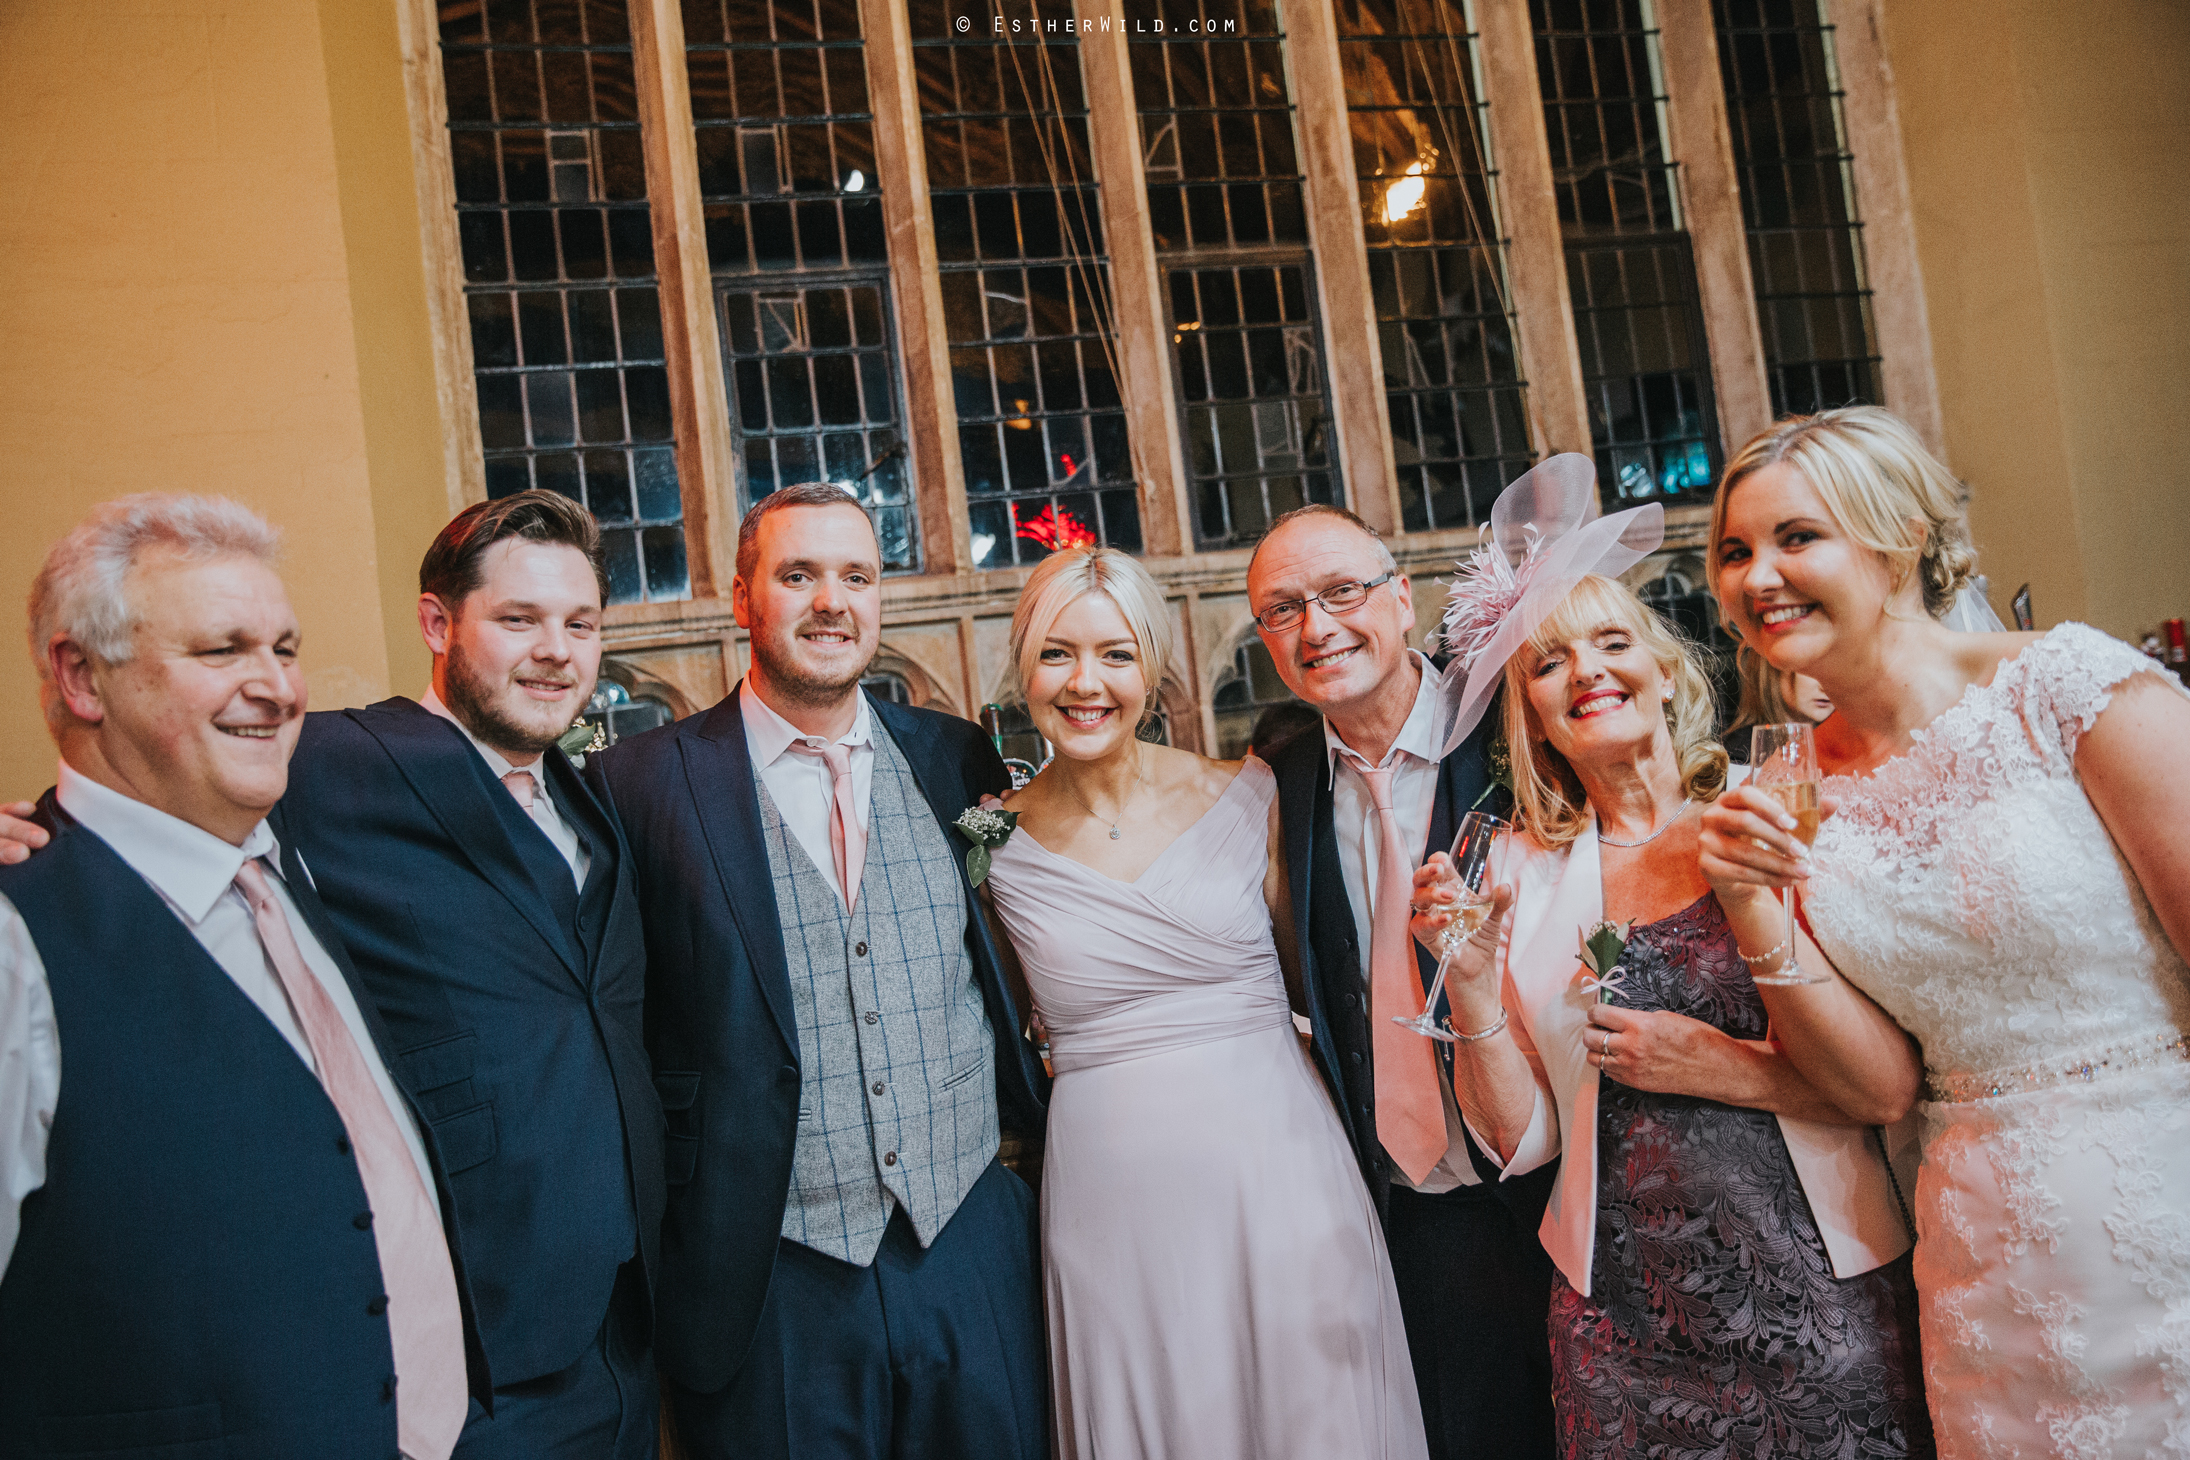 Wedding_Kings_Lynn_Town_Hall_Norfolk_Photographer_Esther_Wild_IMG_1802_IMGL0618.jpg